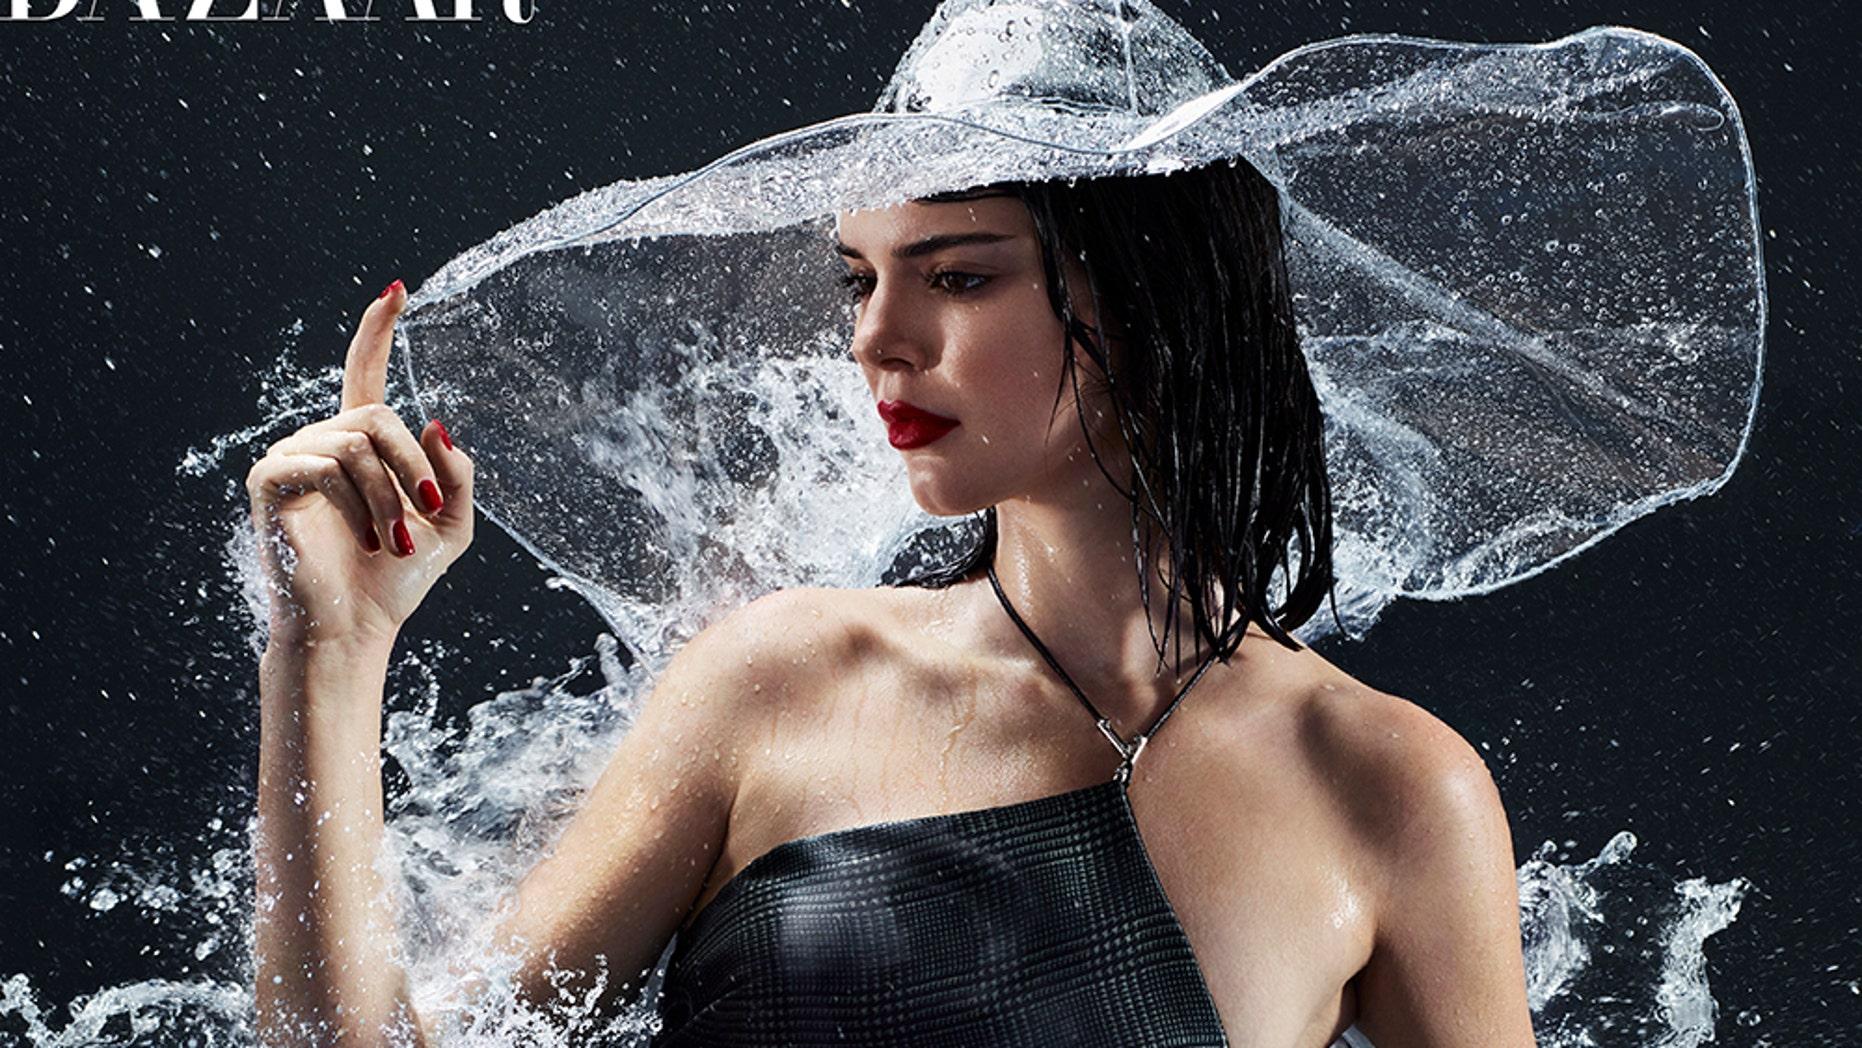 Model/reality TV star Kendall Jenner is the cover girl of Harper's Bazaar February 2018 issue.